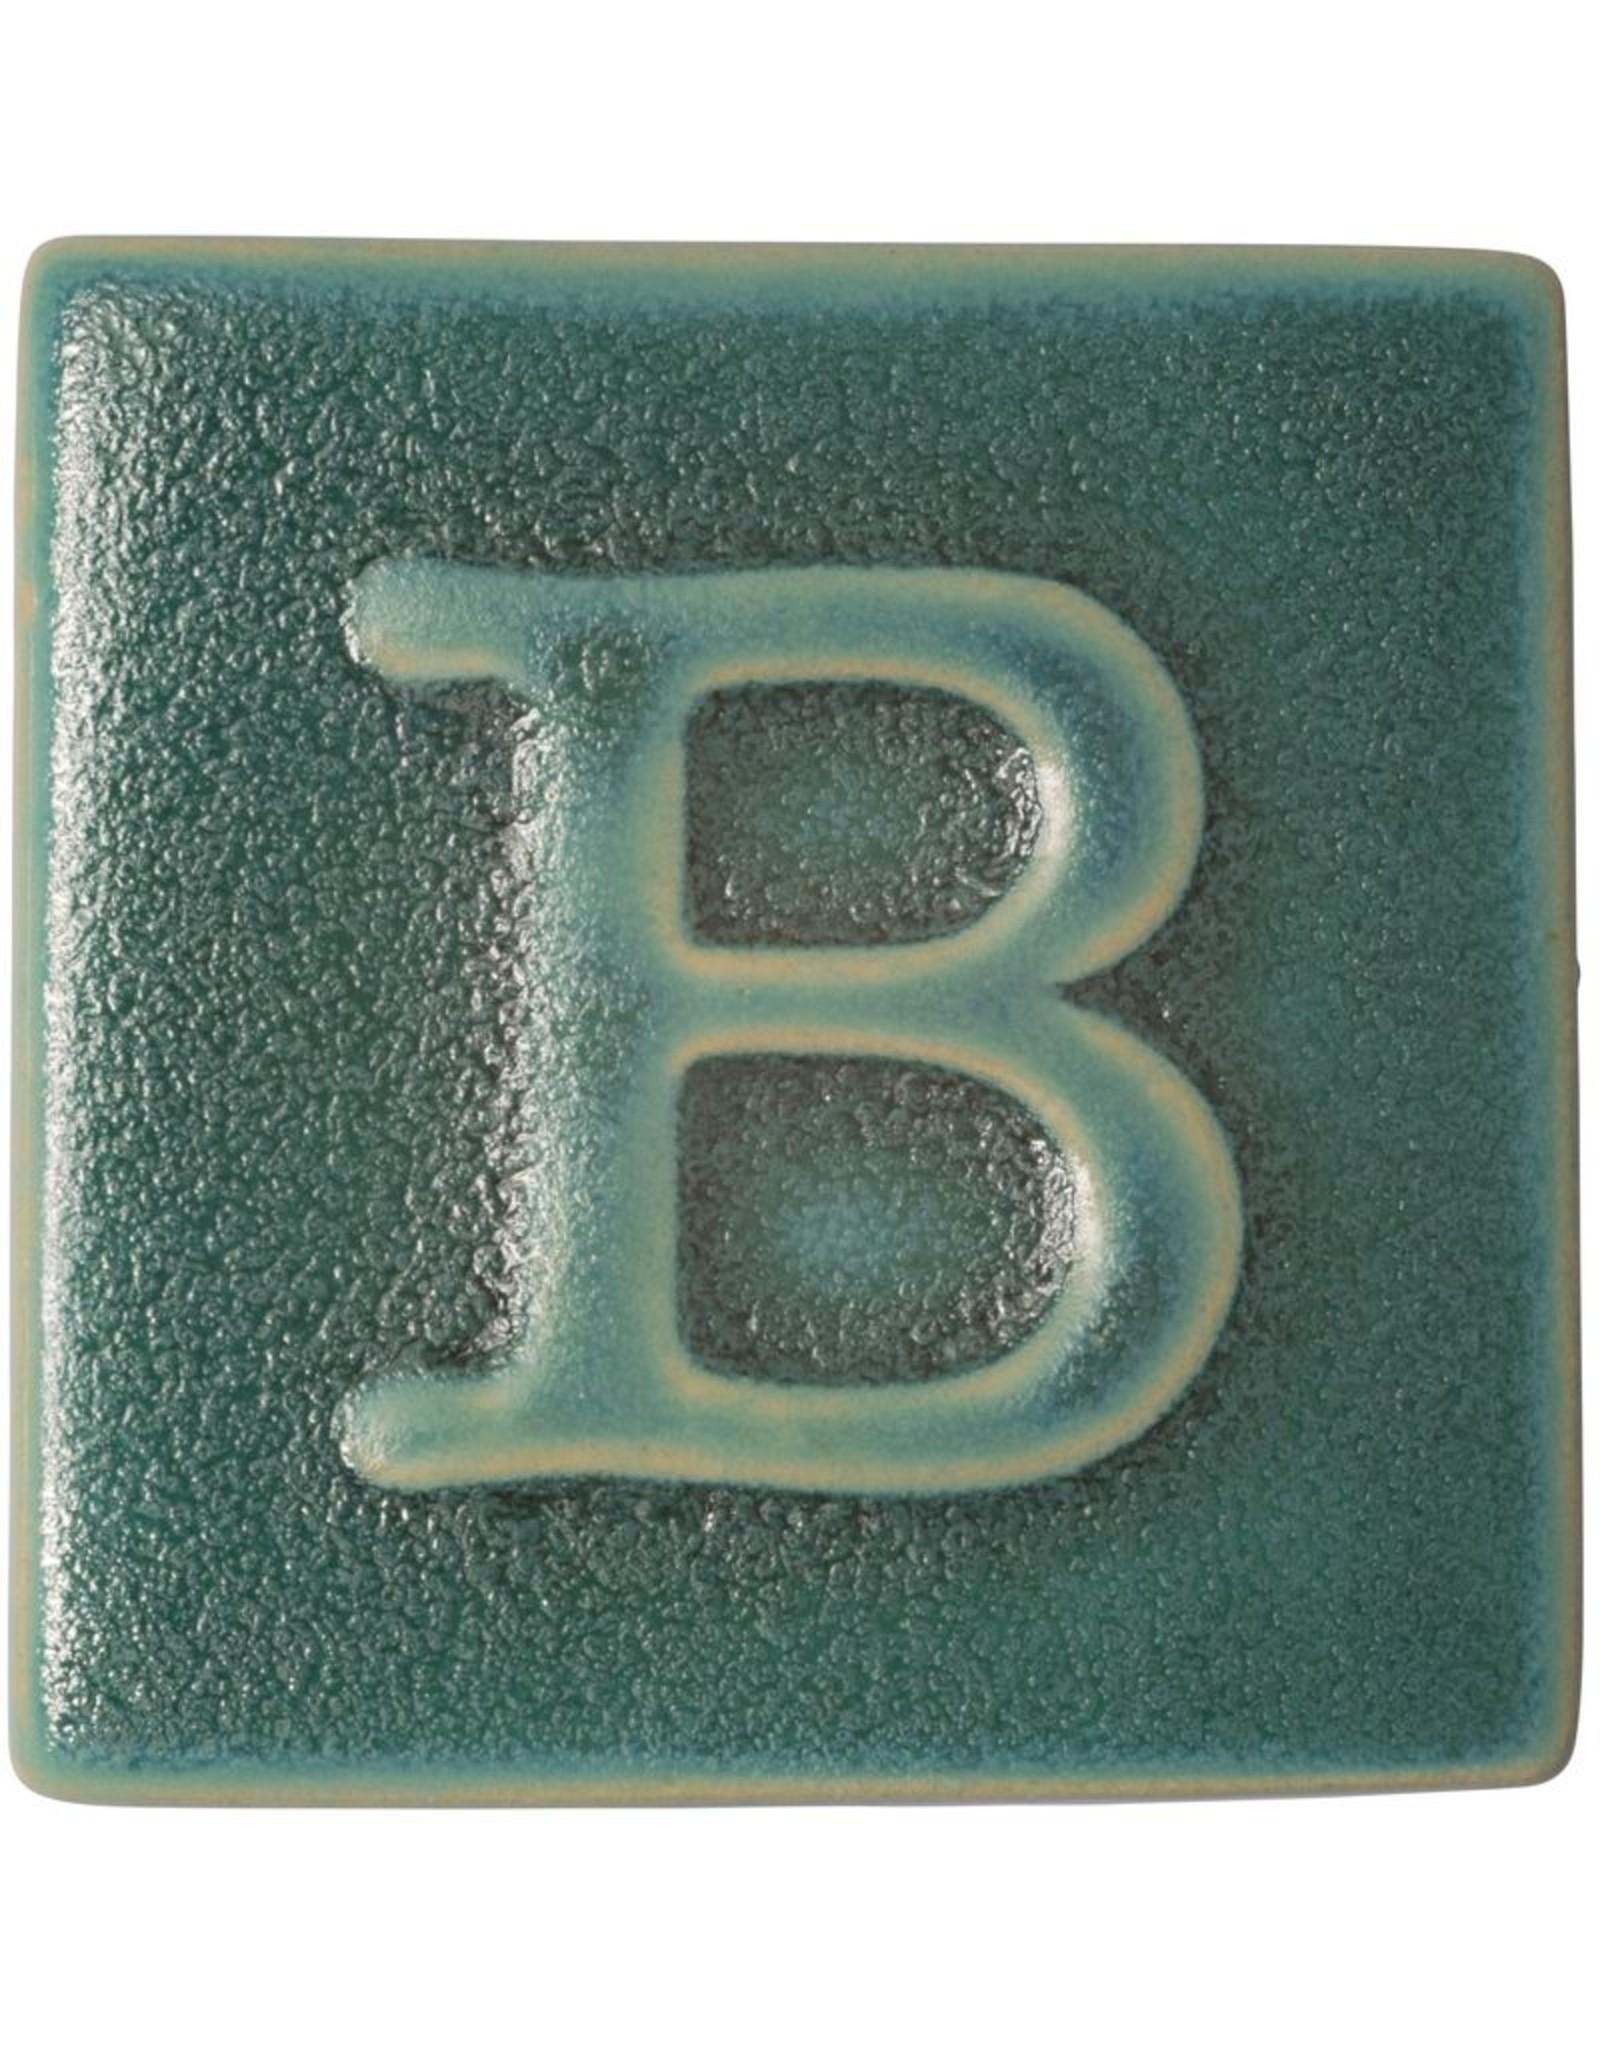 Botz Crystal Turquoise - 200ml